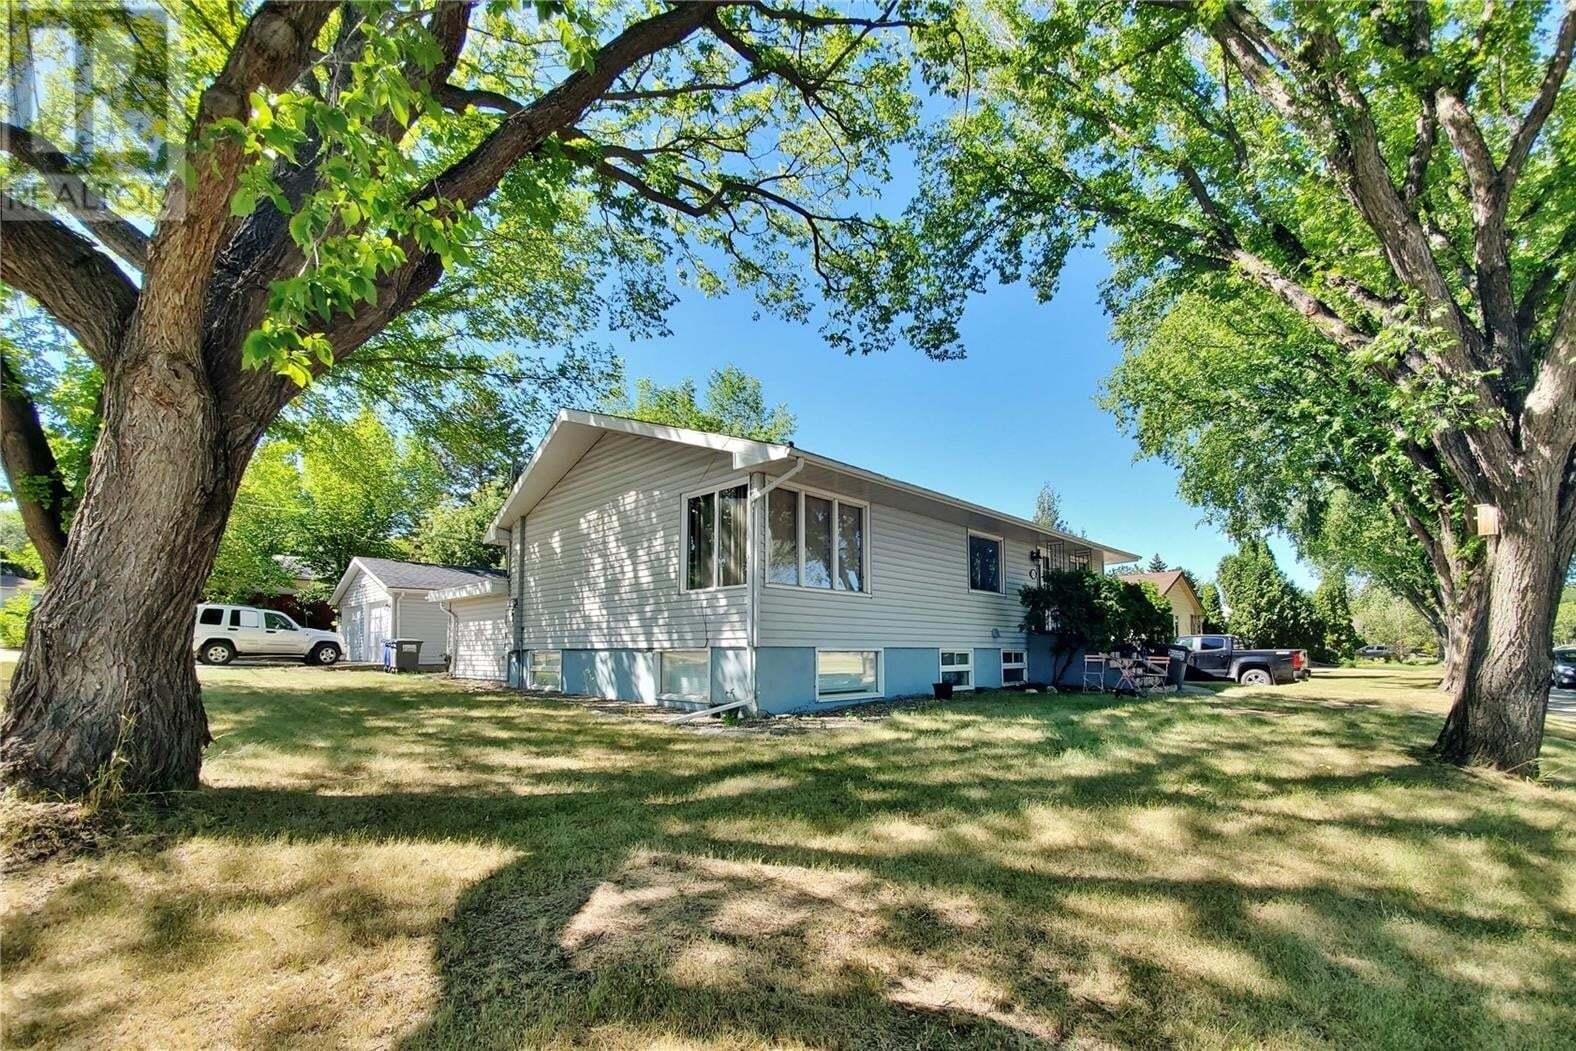 House for sale at 501 O Ave N Saskatoon Saskatchewan - MLS: SK821866